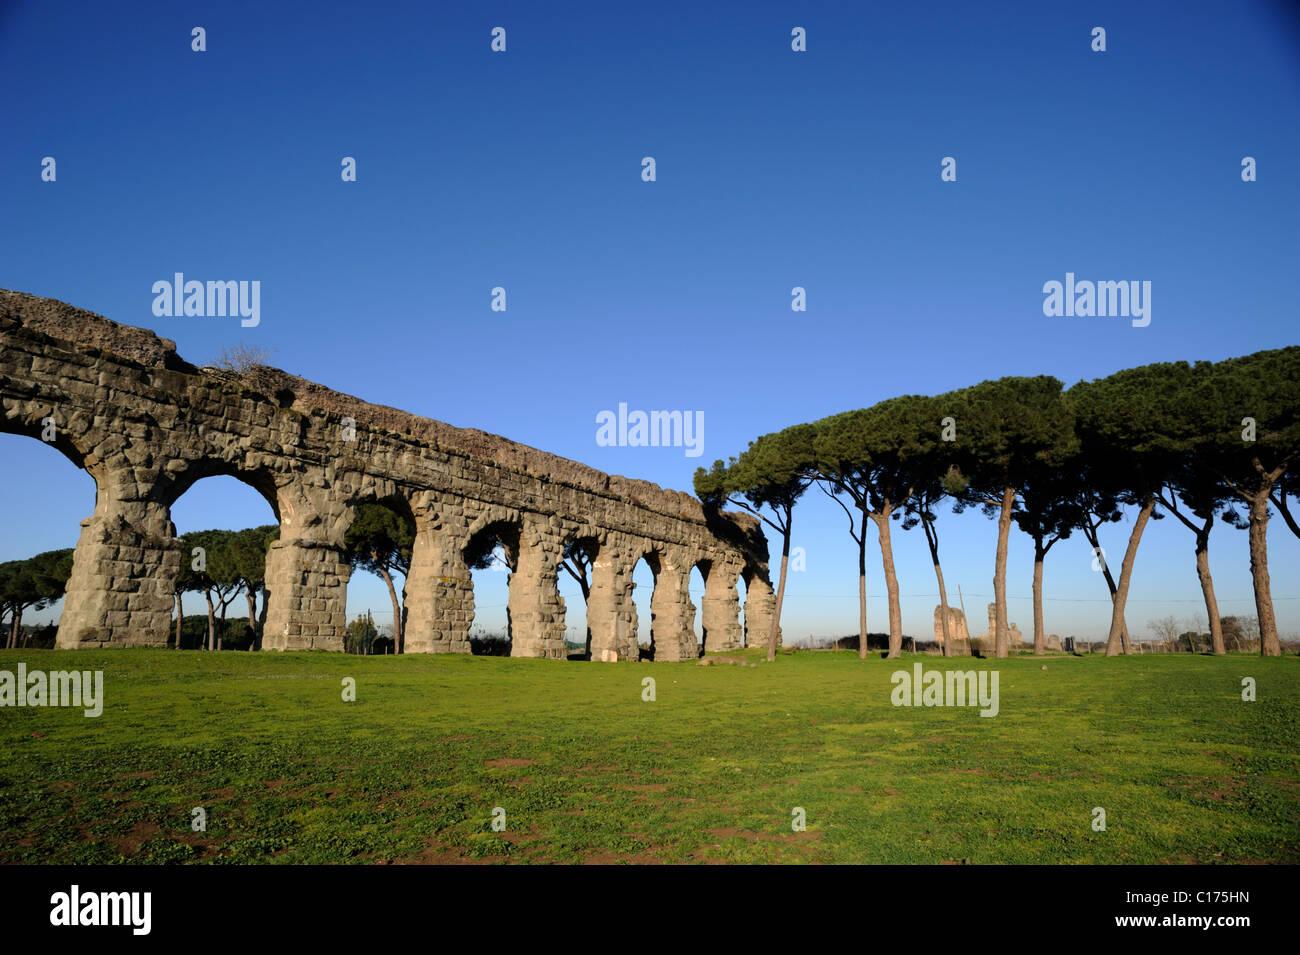 italy, rome, parco degli acquedotti, ancient roman aqueduct - Stock Image